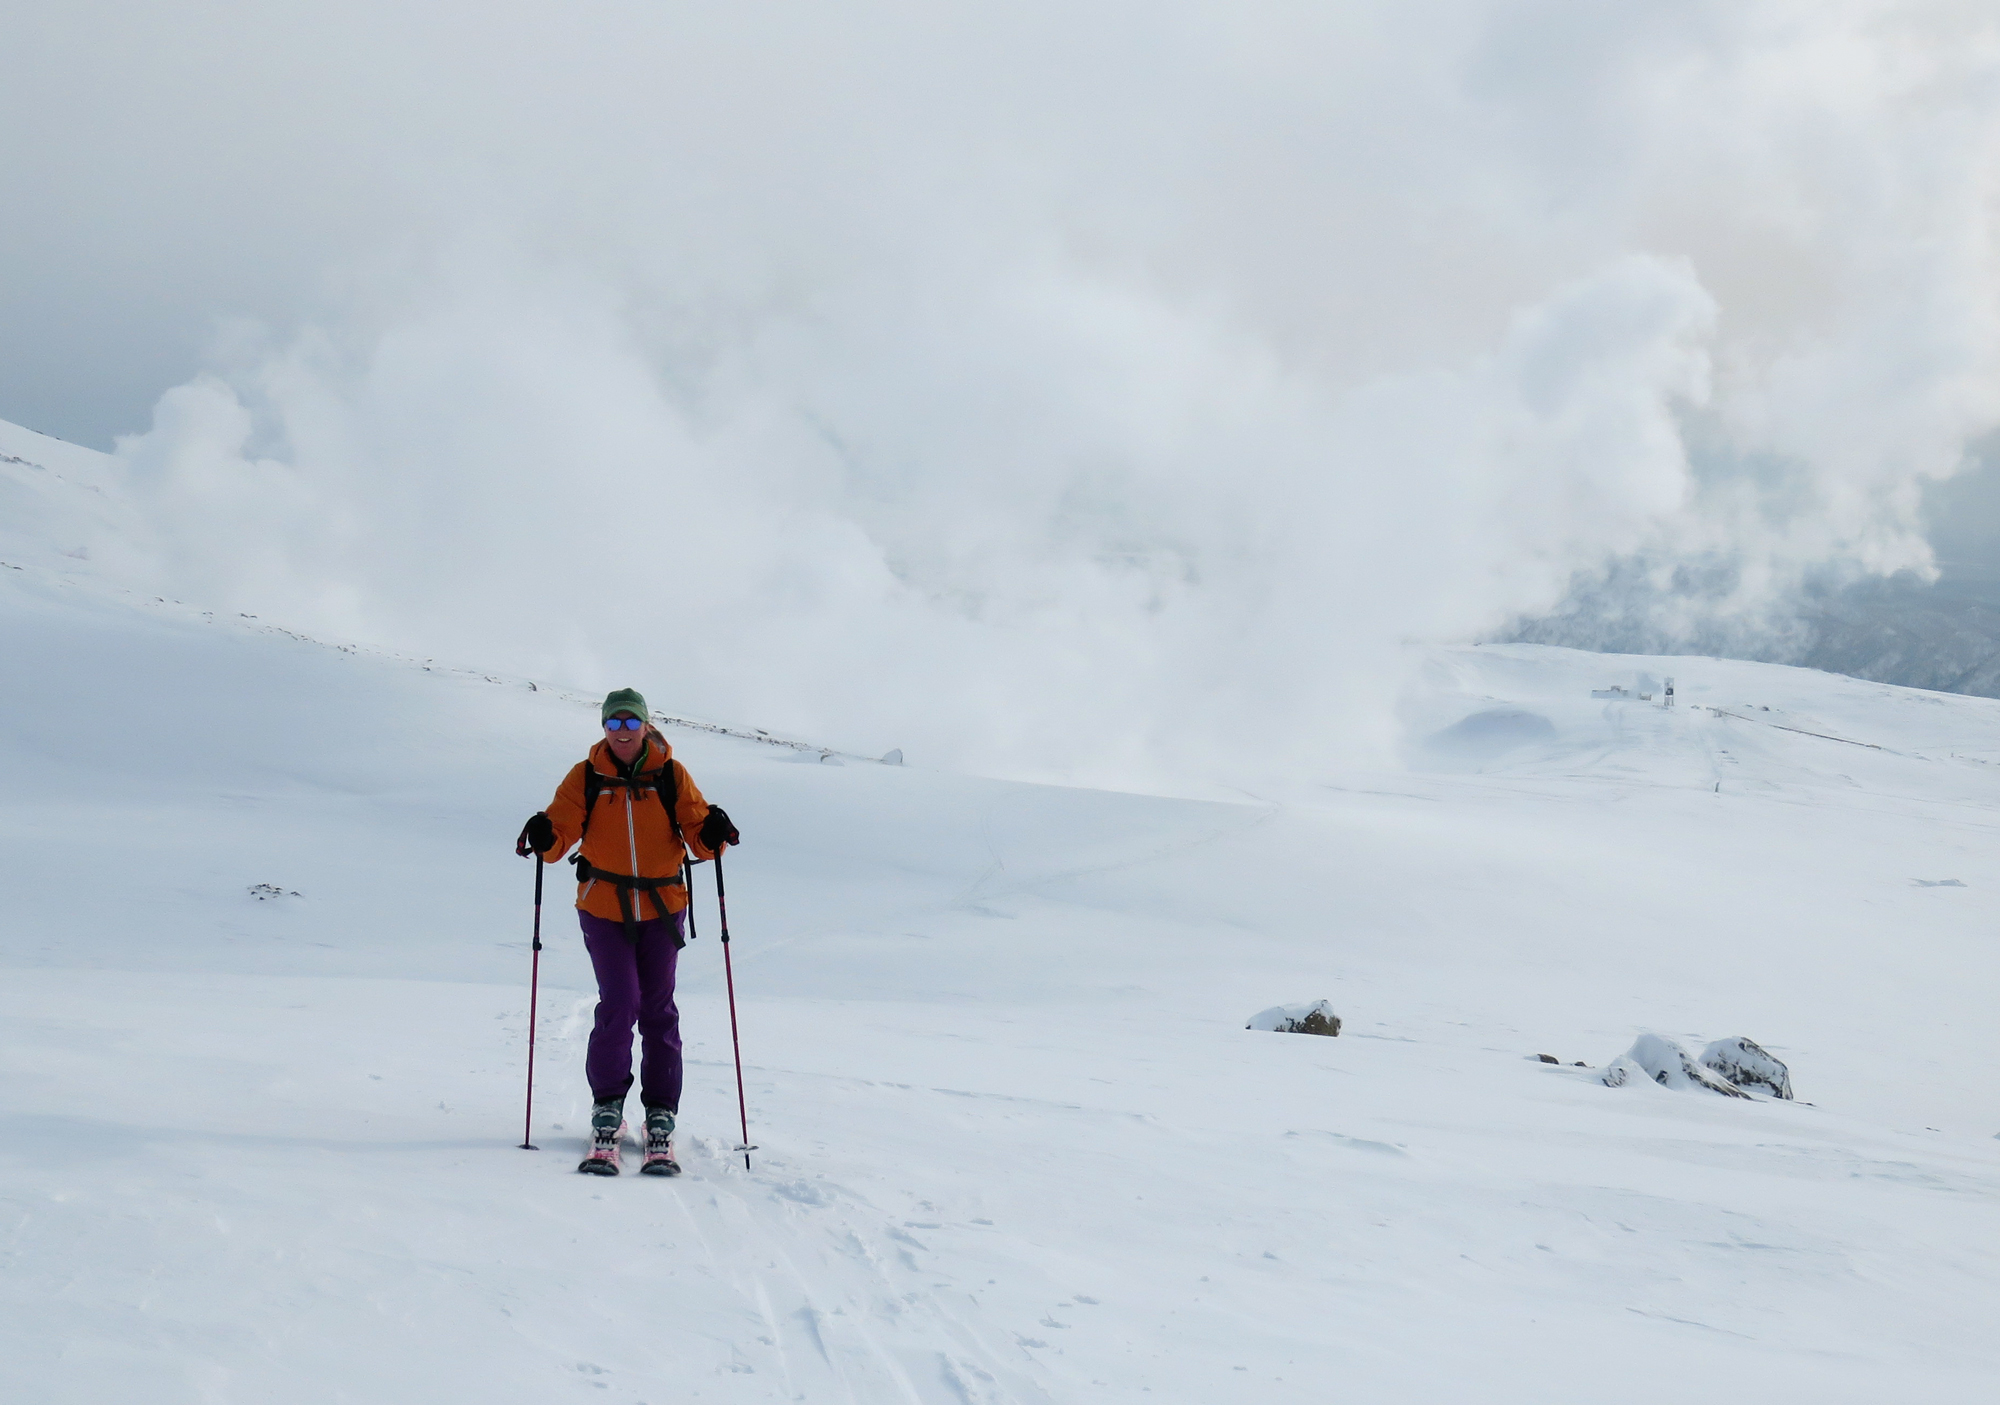 Skinning away from one of the stinky fumaroles at Asahidake.